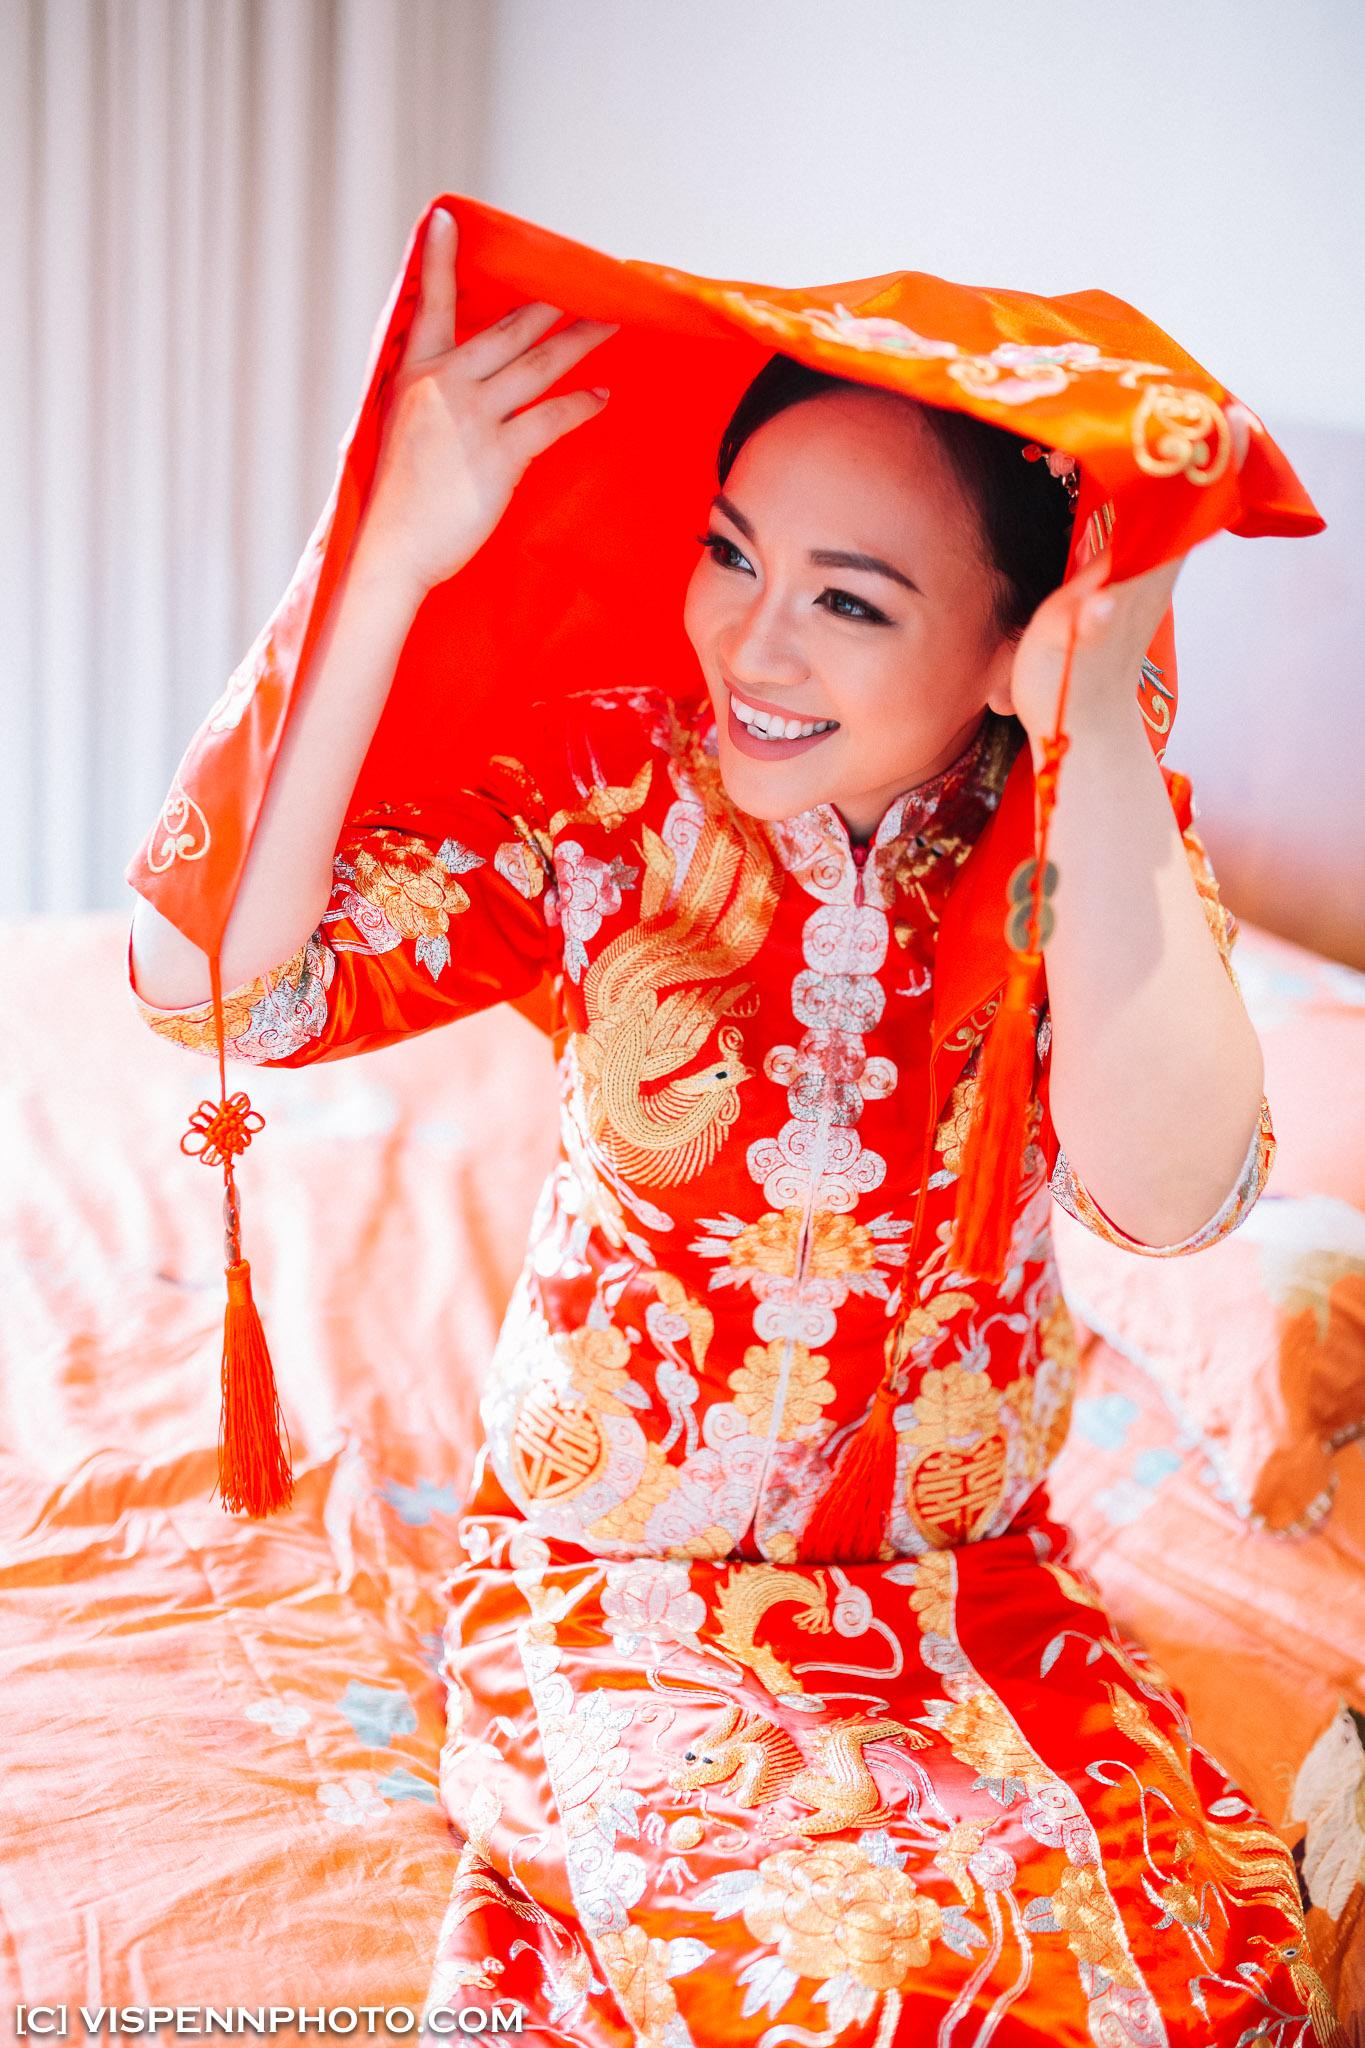 WEDDING DAY Photography Melbourne ZHPENN Kat H1 00082